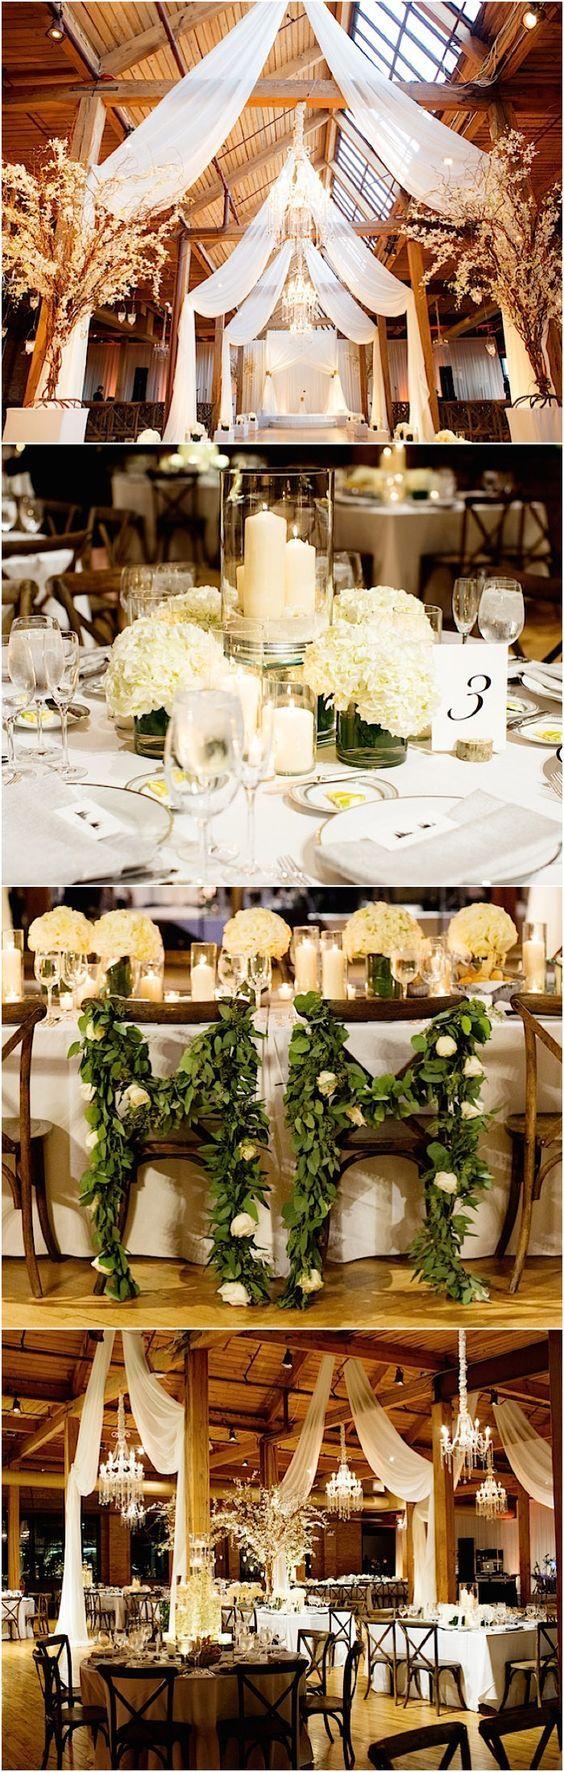 Uncategorized/outdoor vintage glam wedding rustic wedding chic - Best 25 Wedding Reception Barns Ideas On Pinterest Wedding Reception Drinks Rustic Wedding Foods And Outdoor Wedding Reception